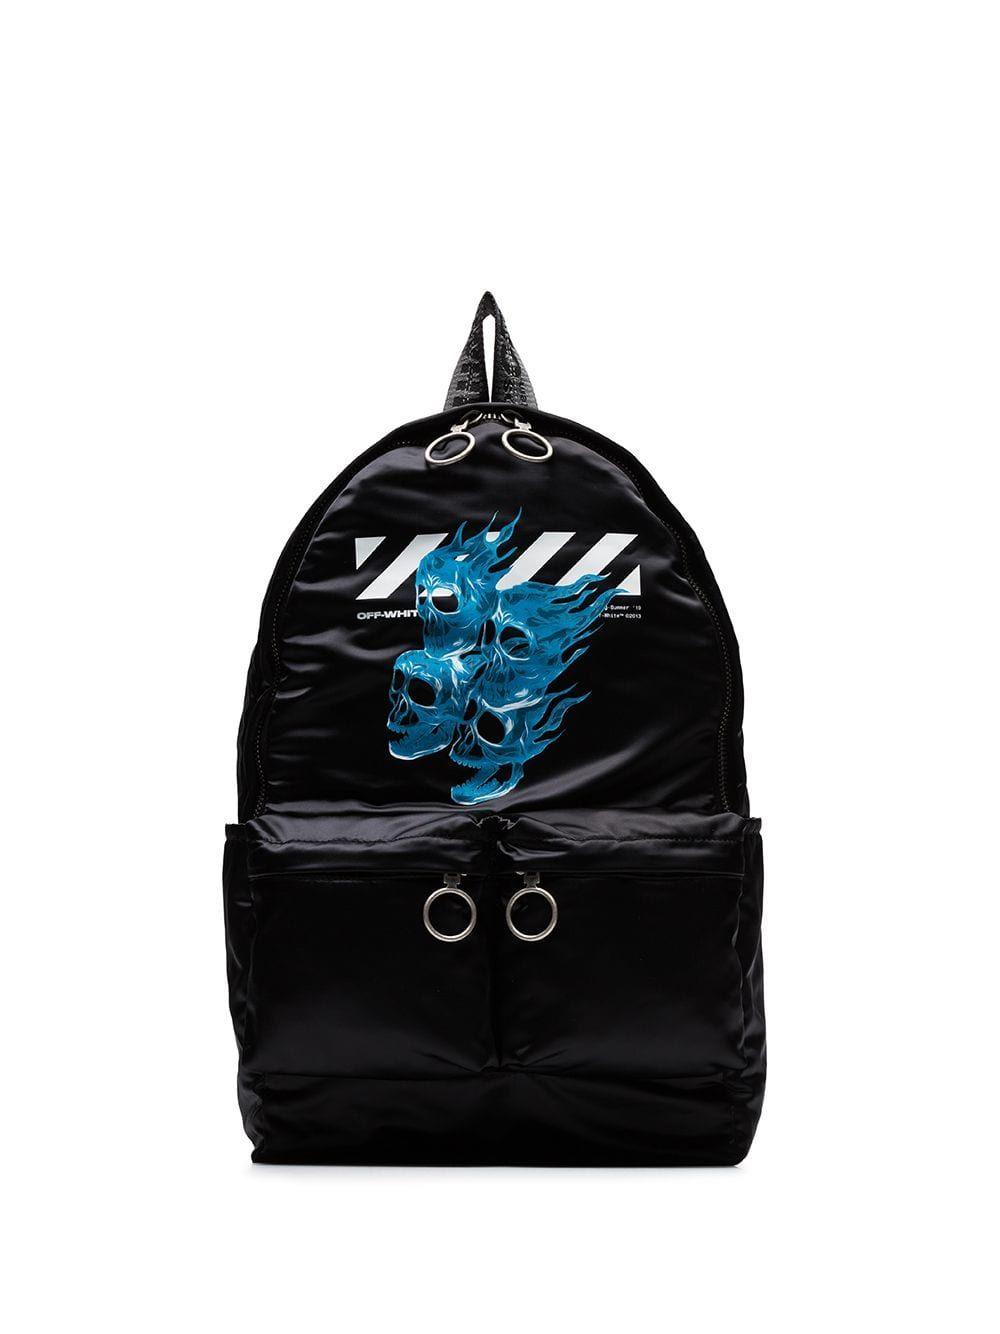 115635209 OFF-WHITE OFF-WHITE BLACK AND BLUE SKULLS PRINT BACKPACK. #off-white #bags  #backpacks